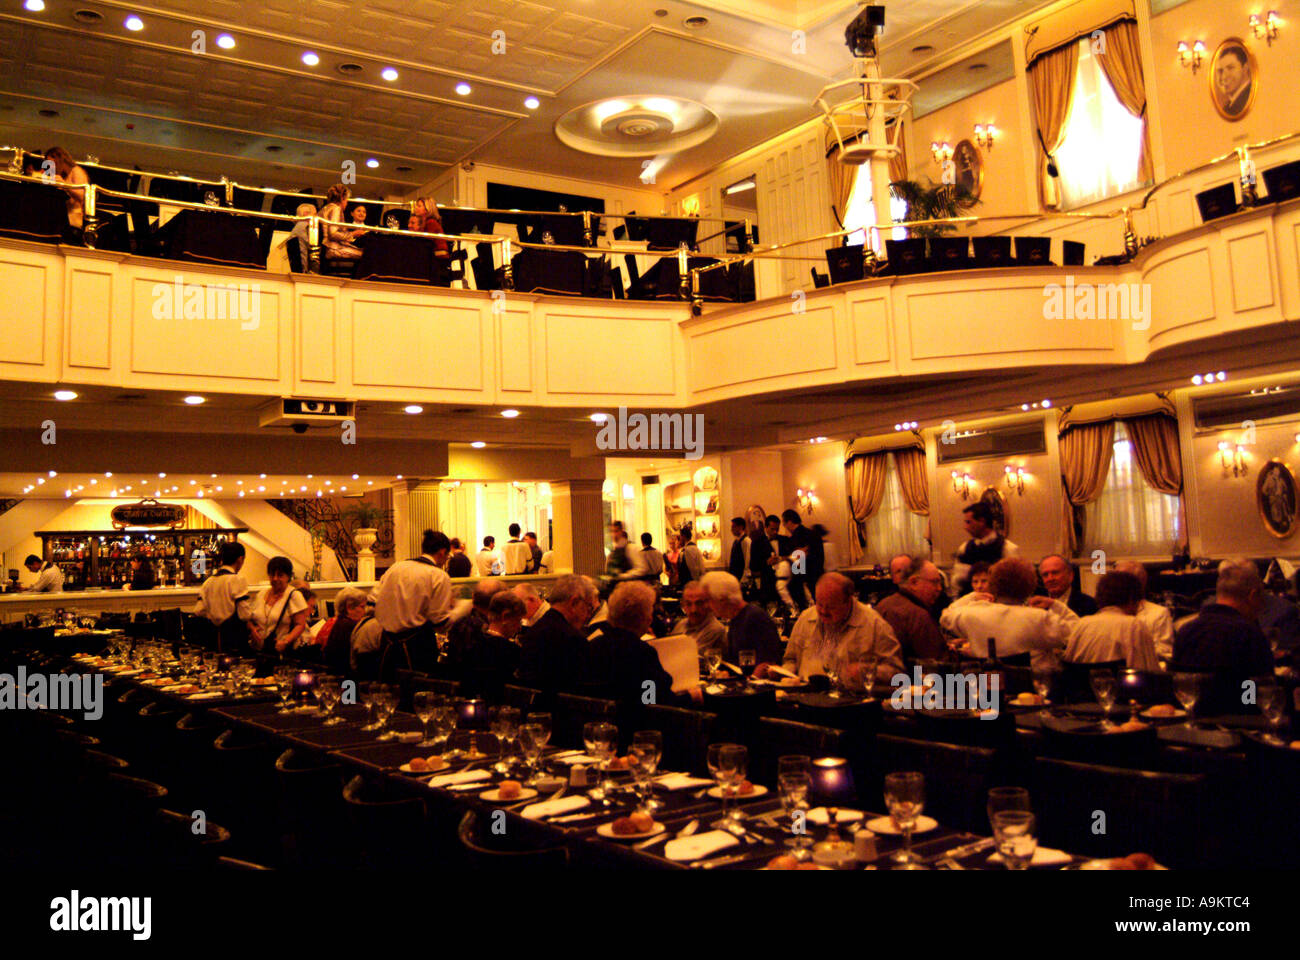 Abendessen Theater Stockfotos & Abendessen Theater Bilder - Alamy